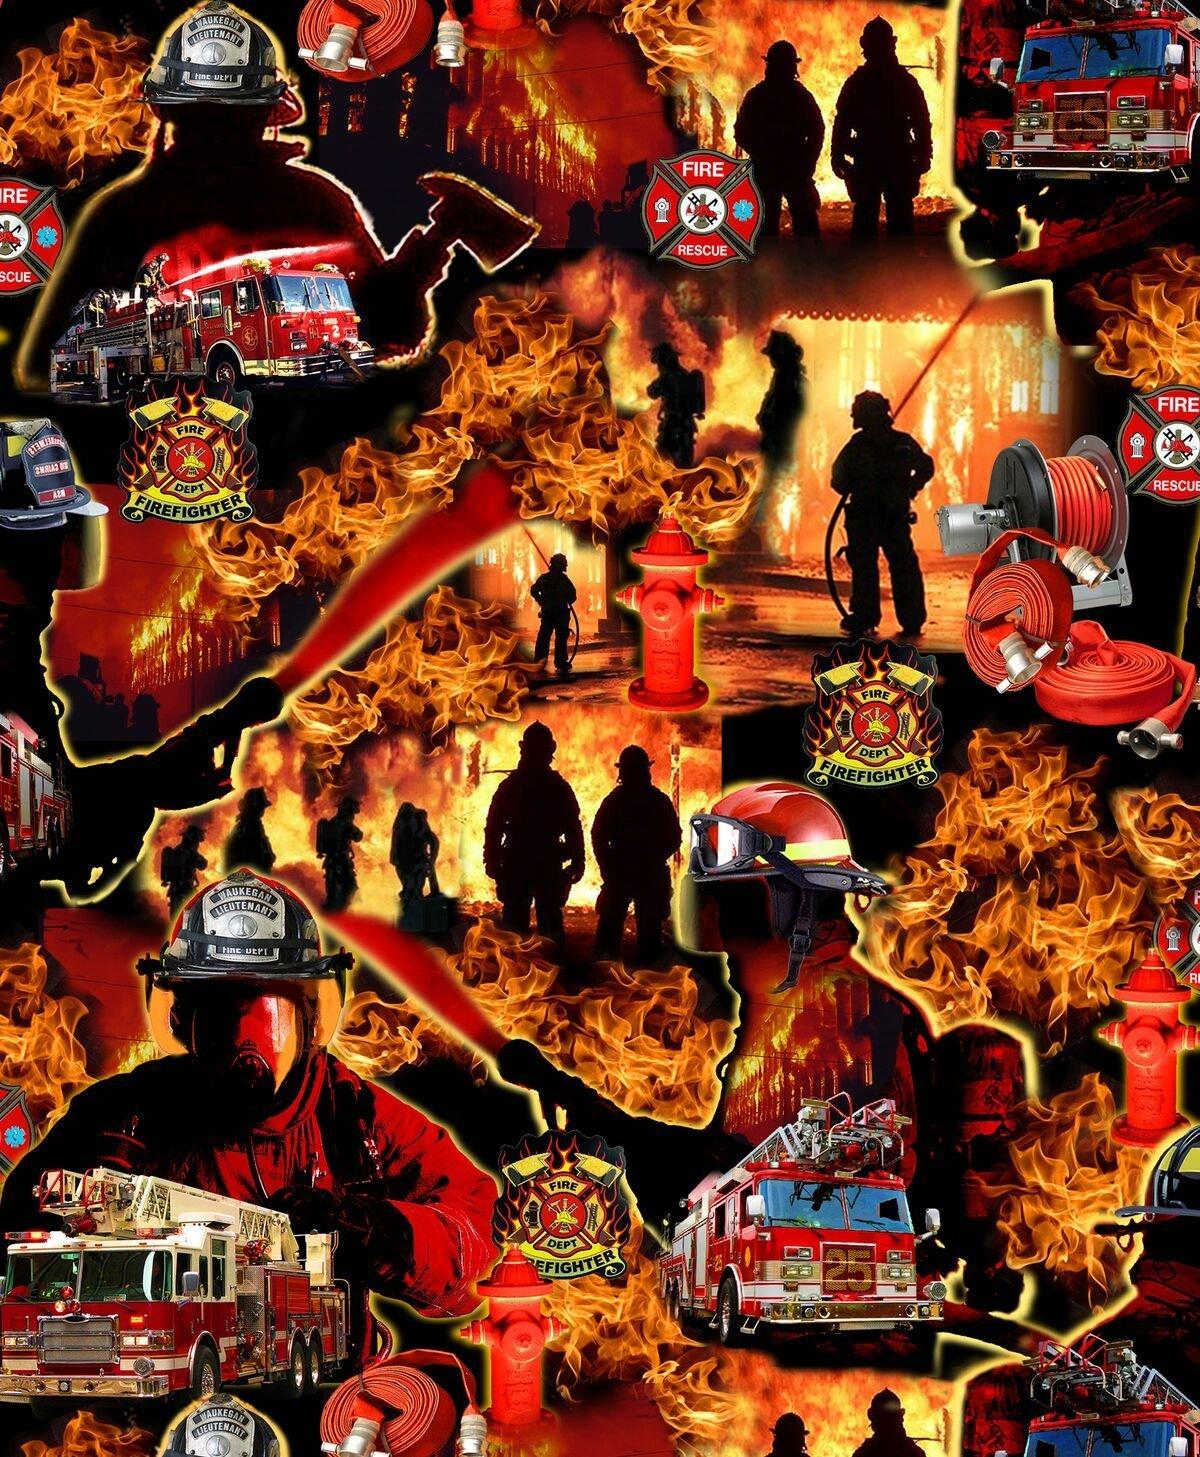 Under Fire 580 Red